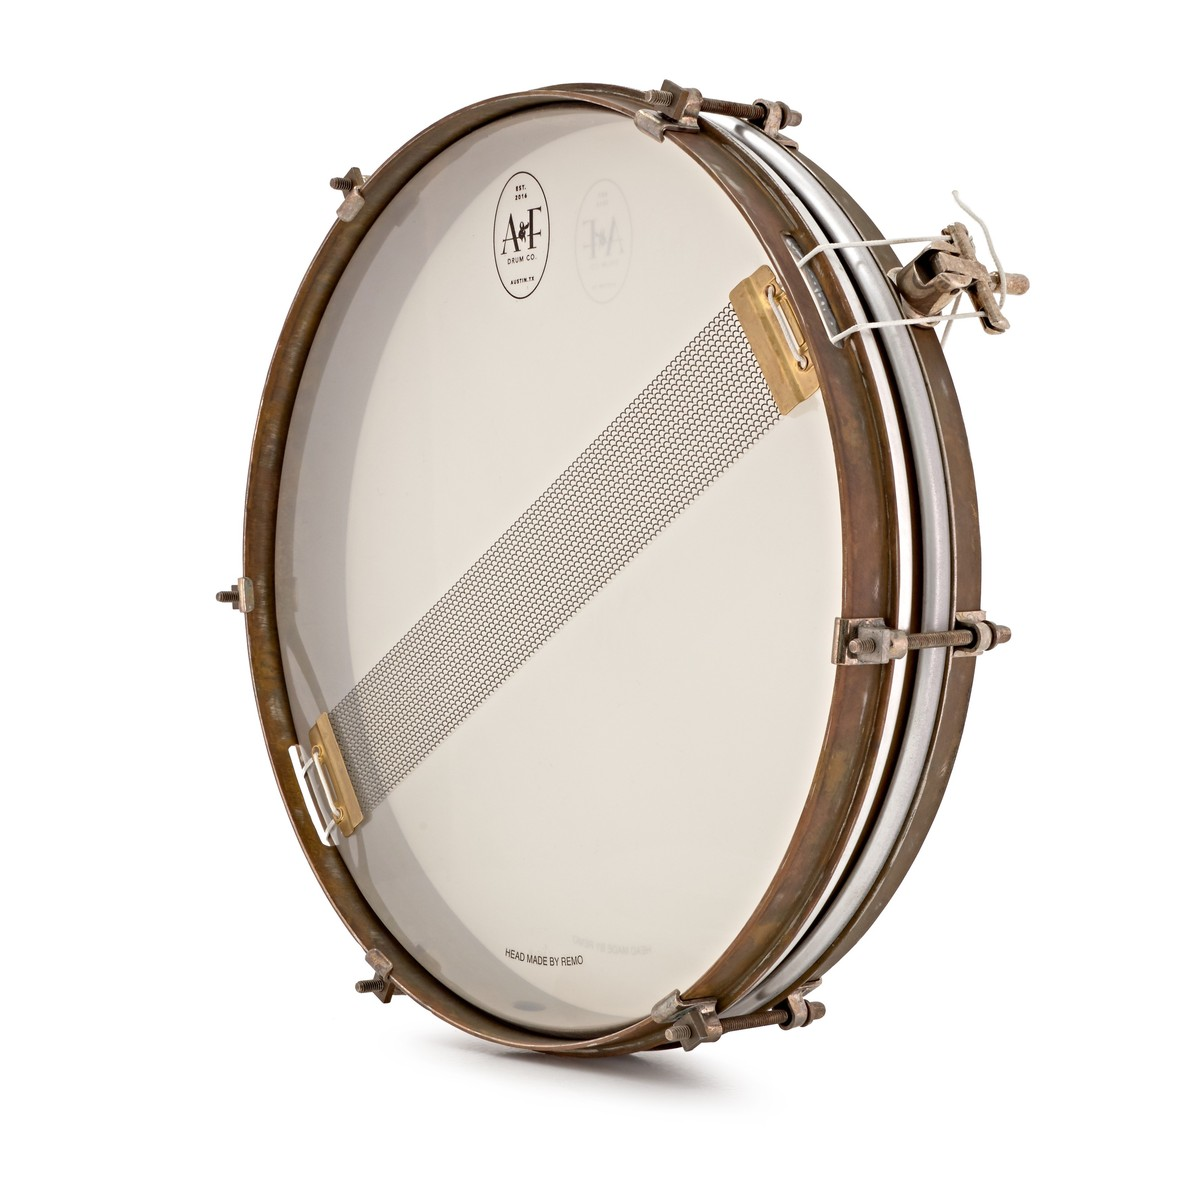 A&F 1.5x14 Pancake Snare